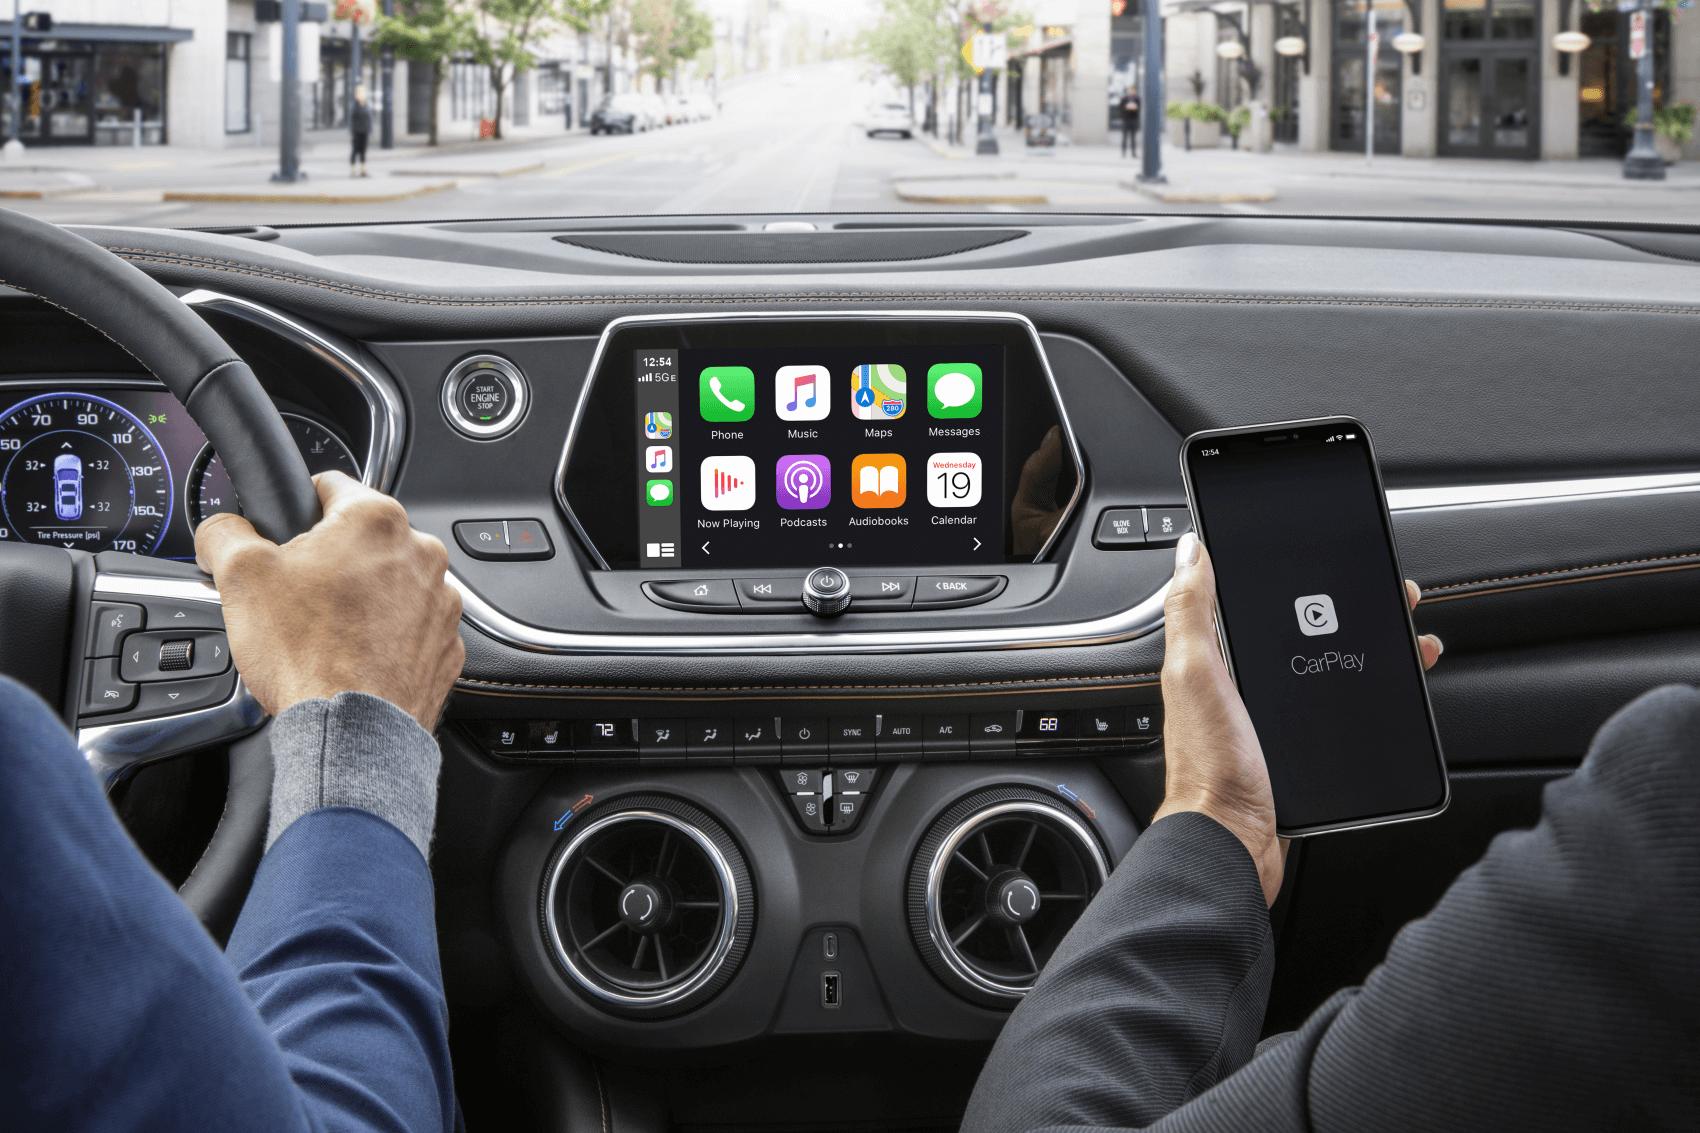 2021 Chevy Blazer Interior Tech